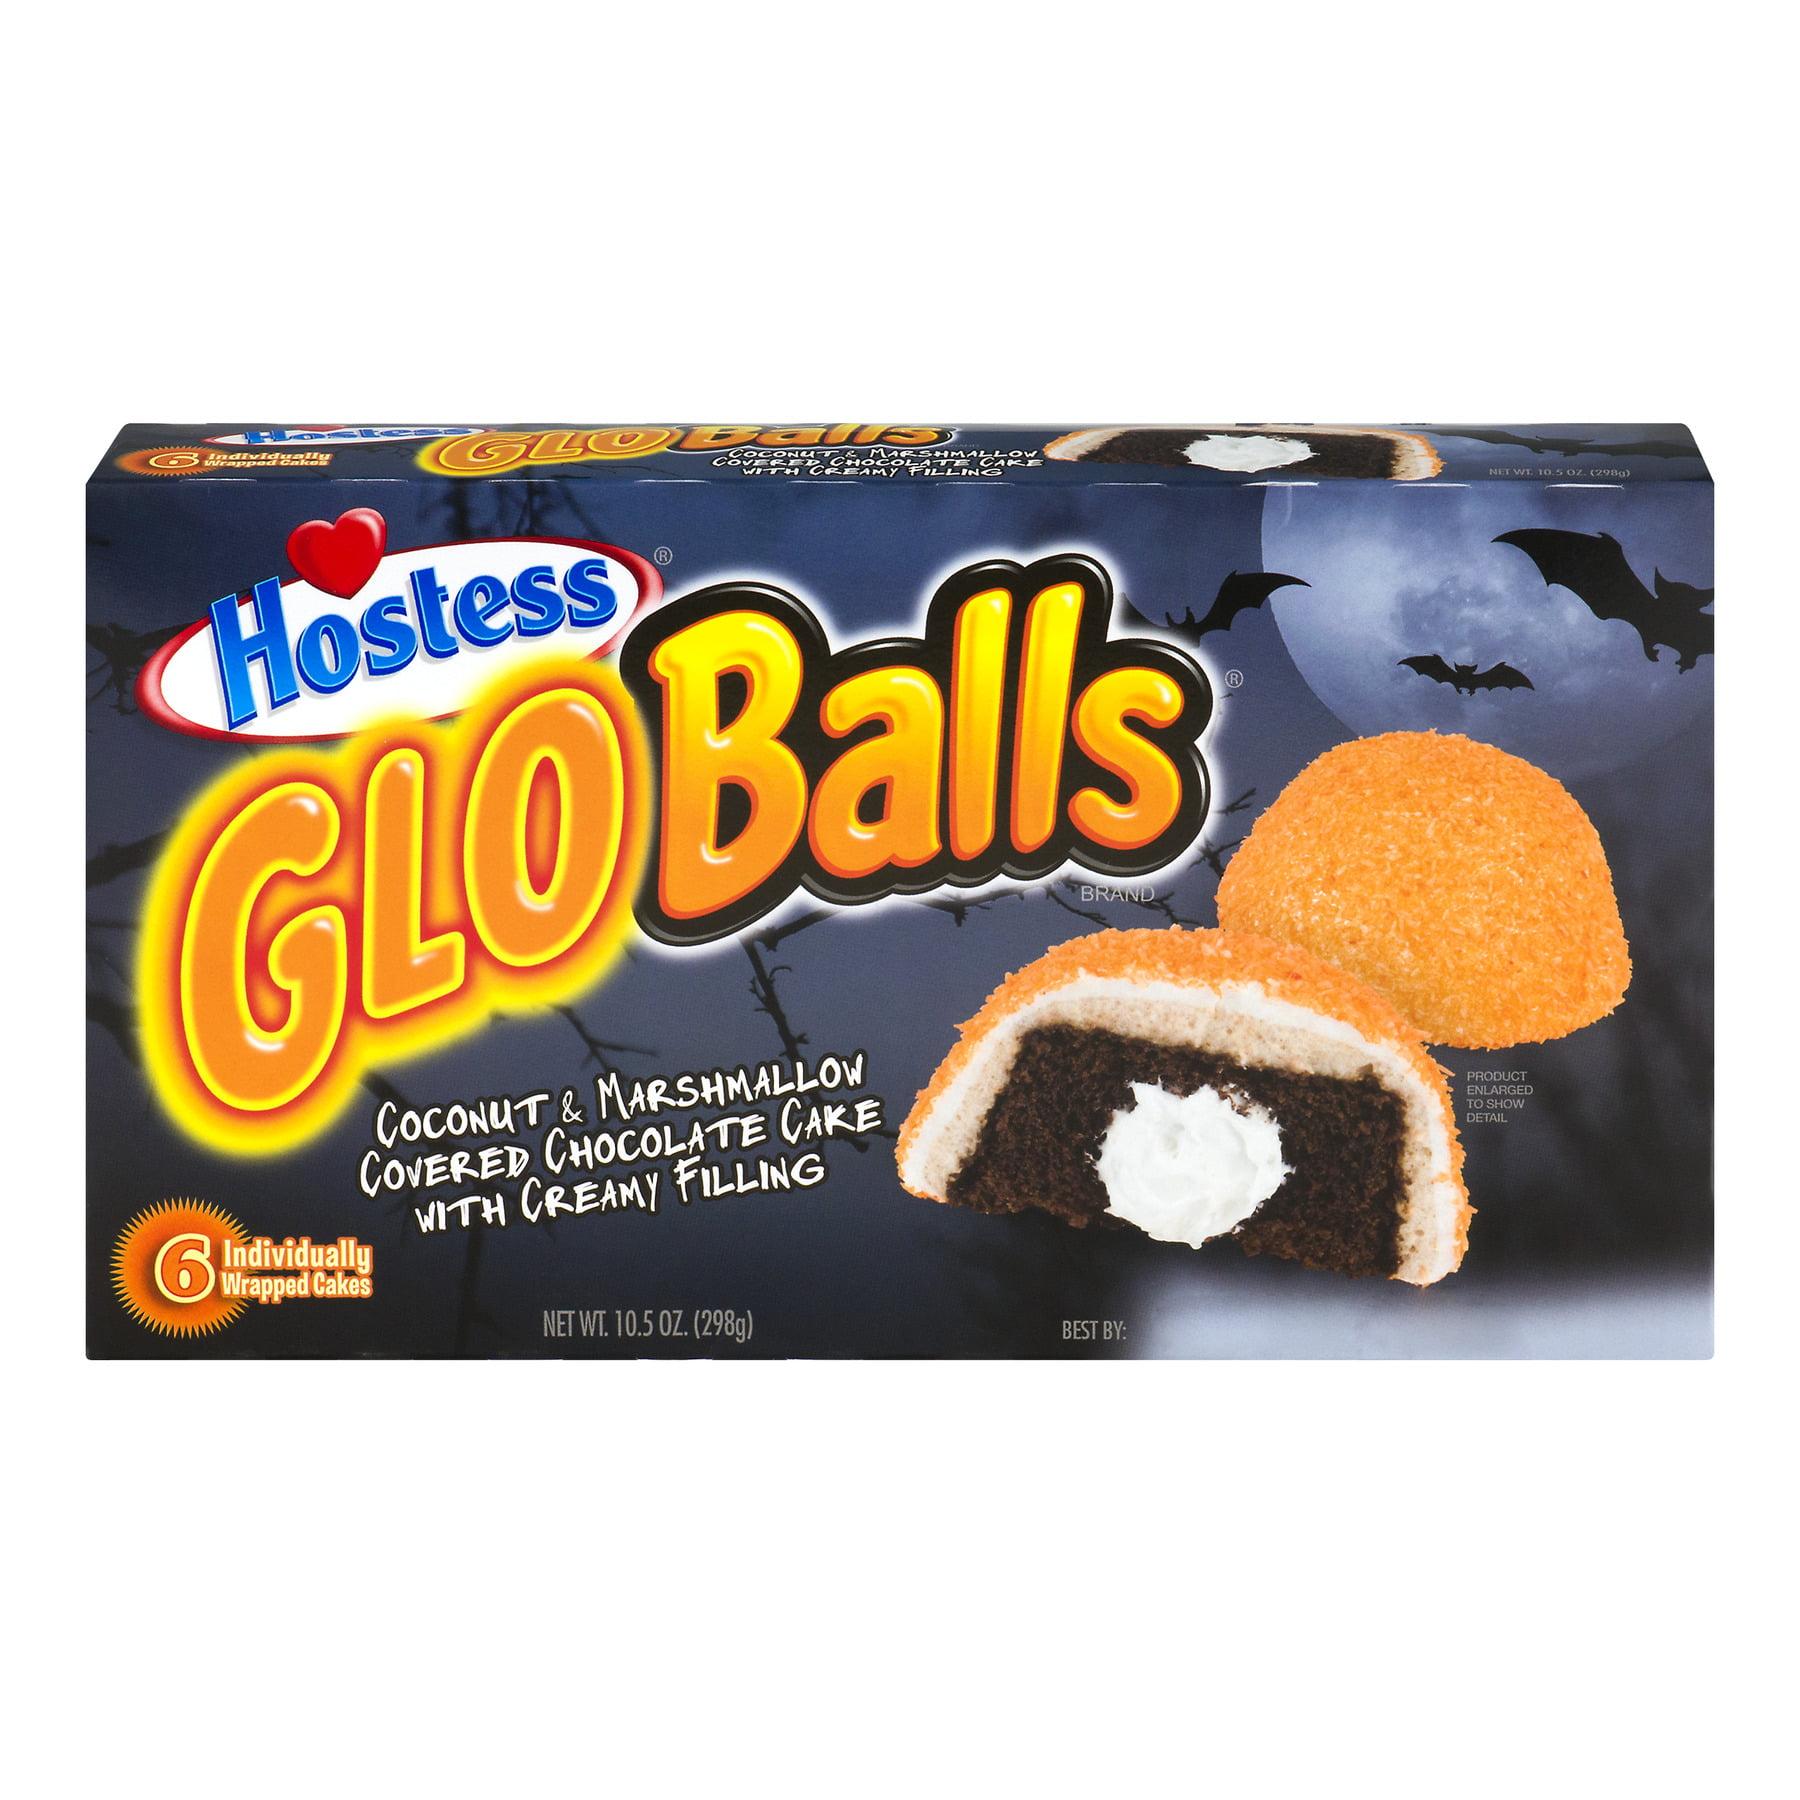 Hostess® GloBalls® Snack Cakes 10.5 oz. Box